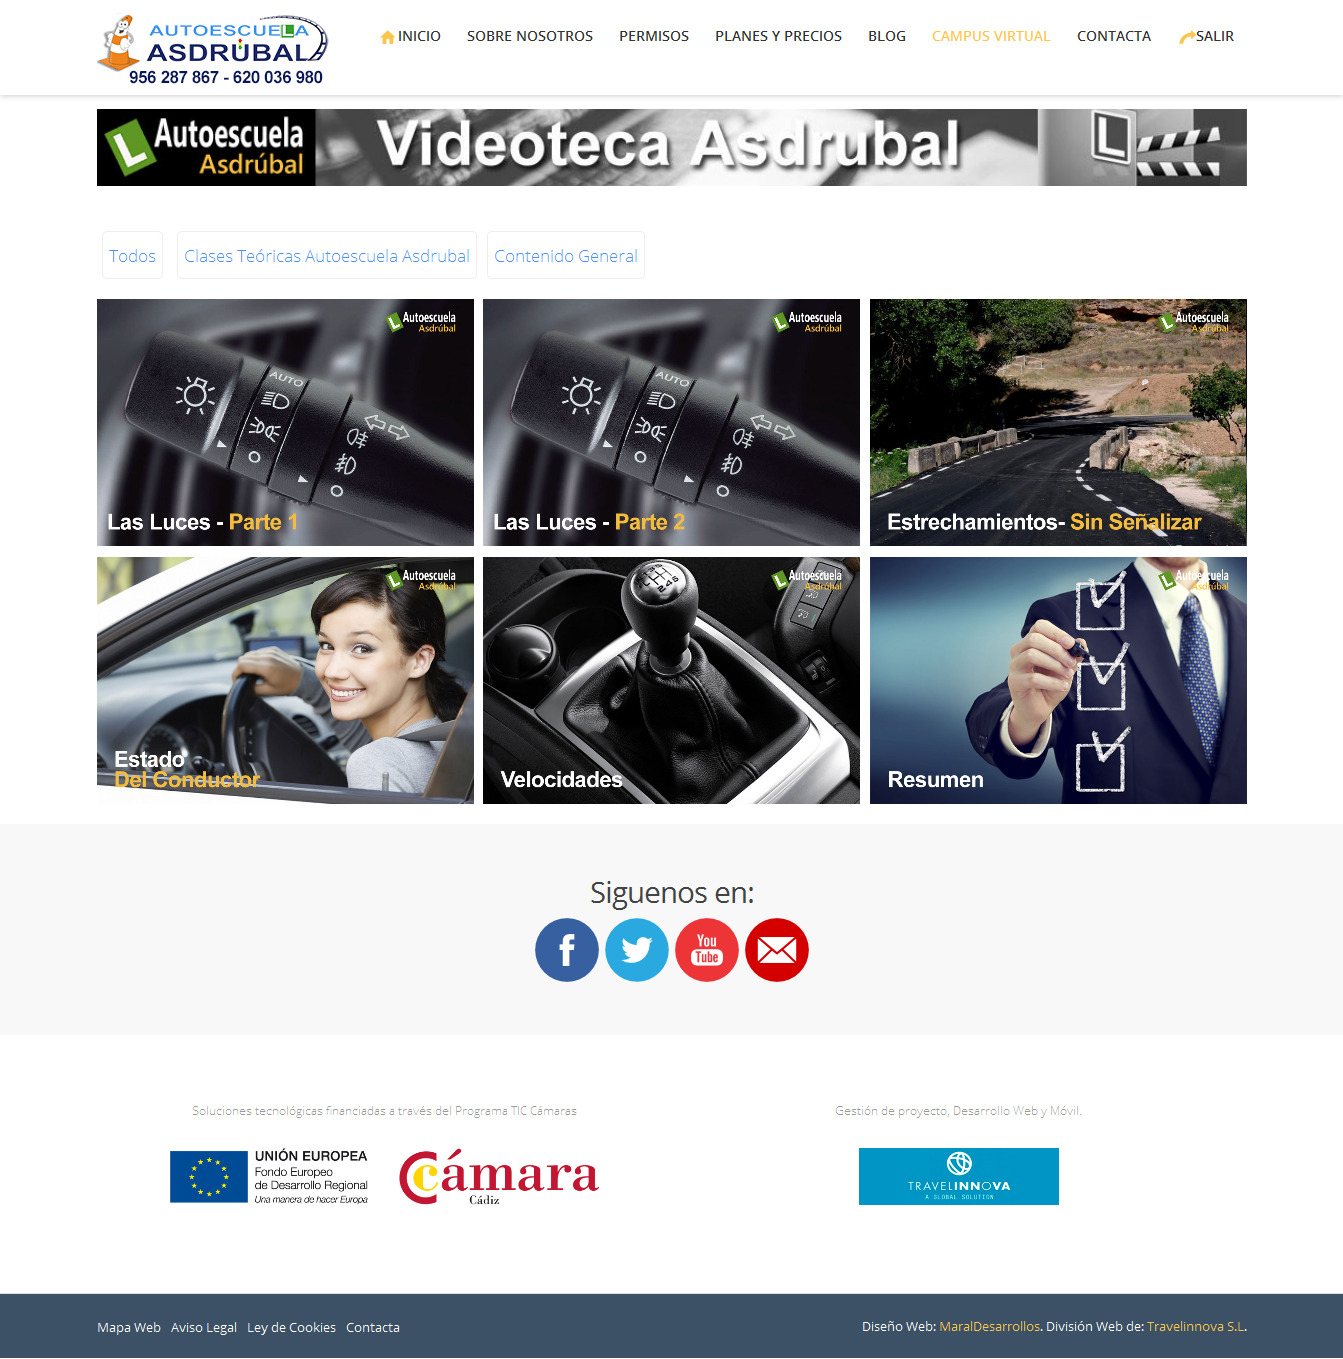 0012-autoescuela-asadrubal-cadiz-videos